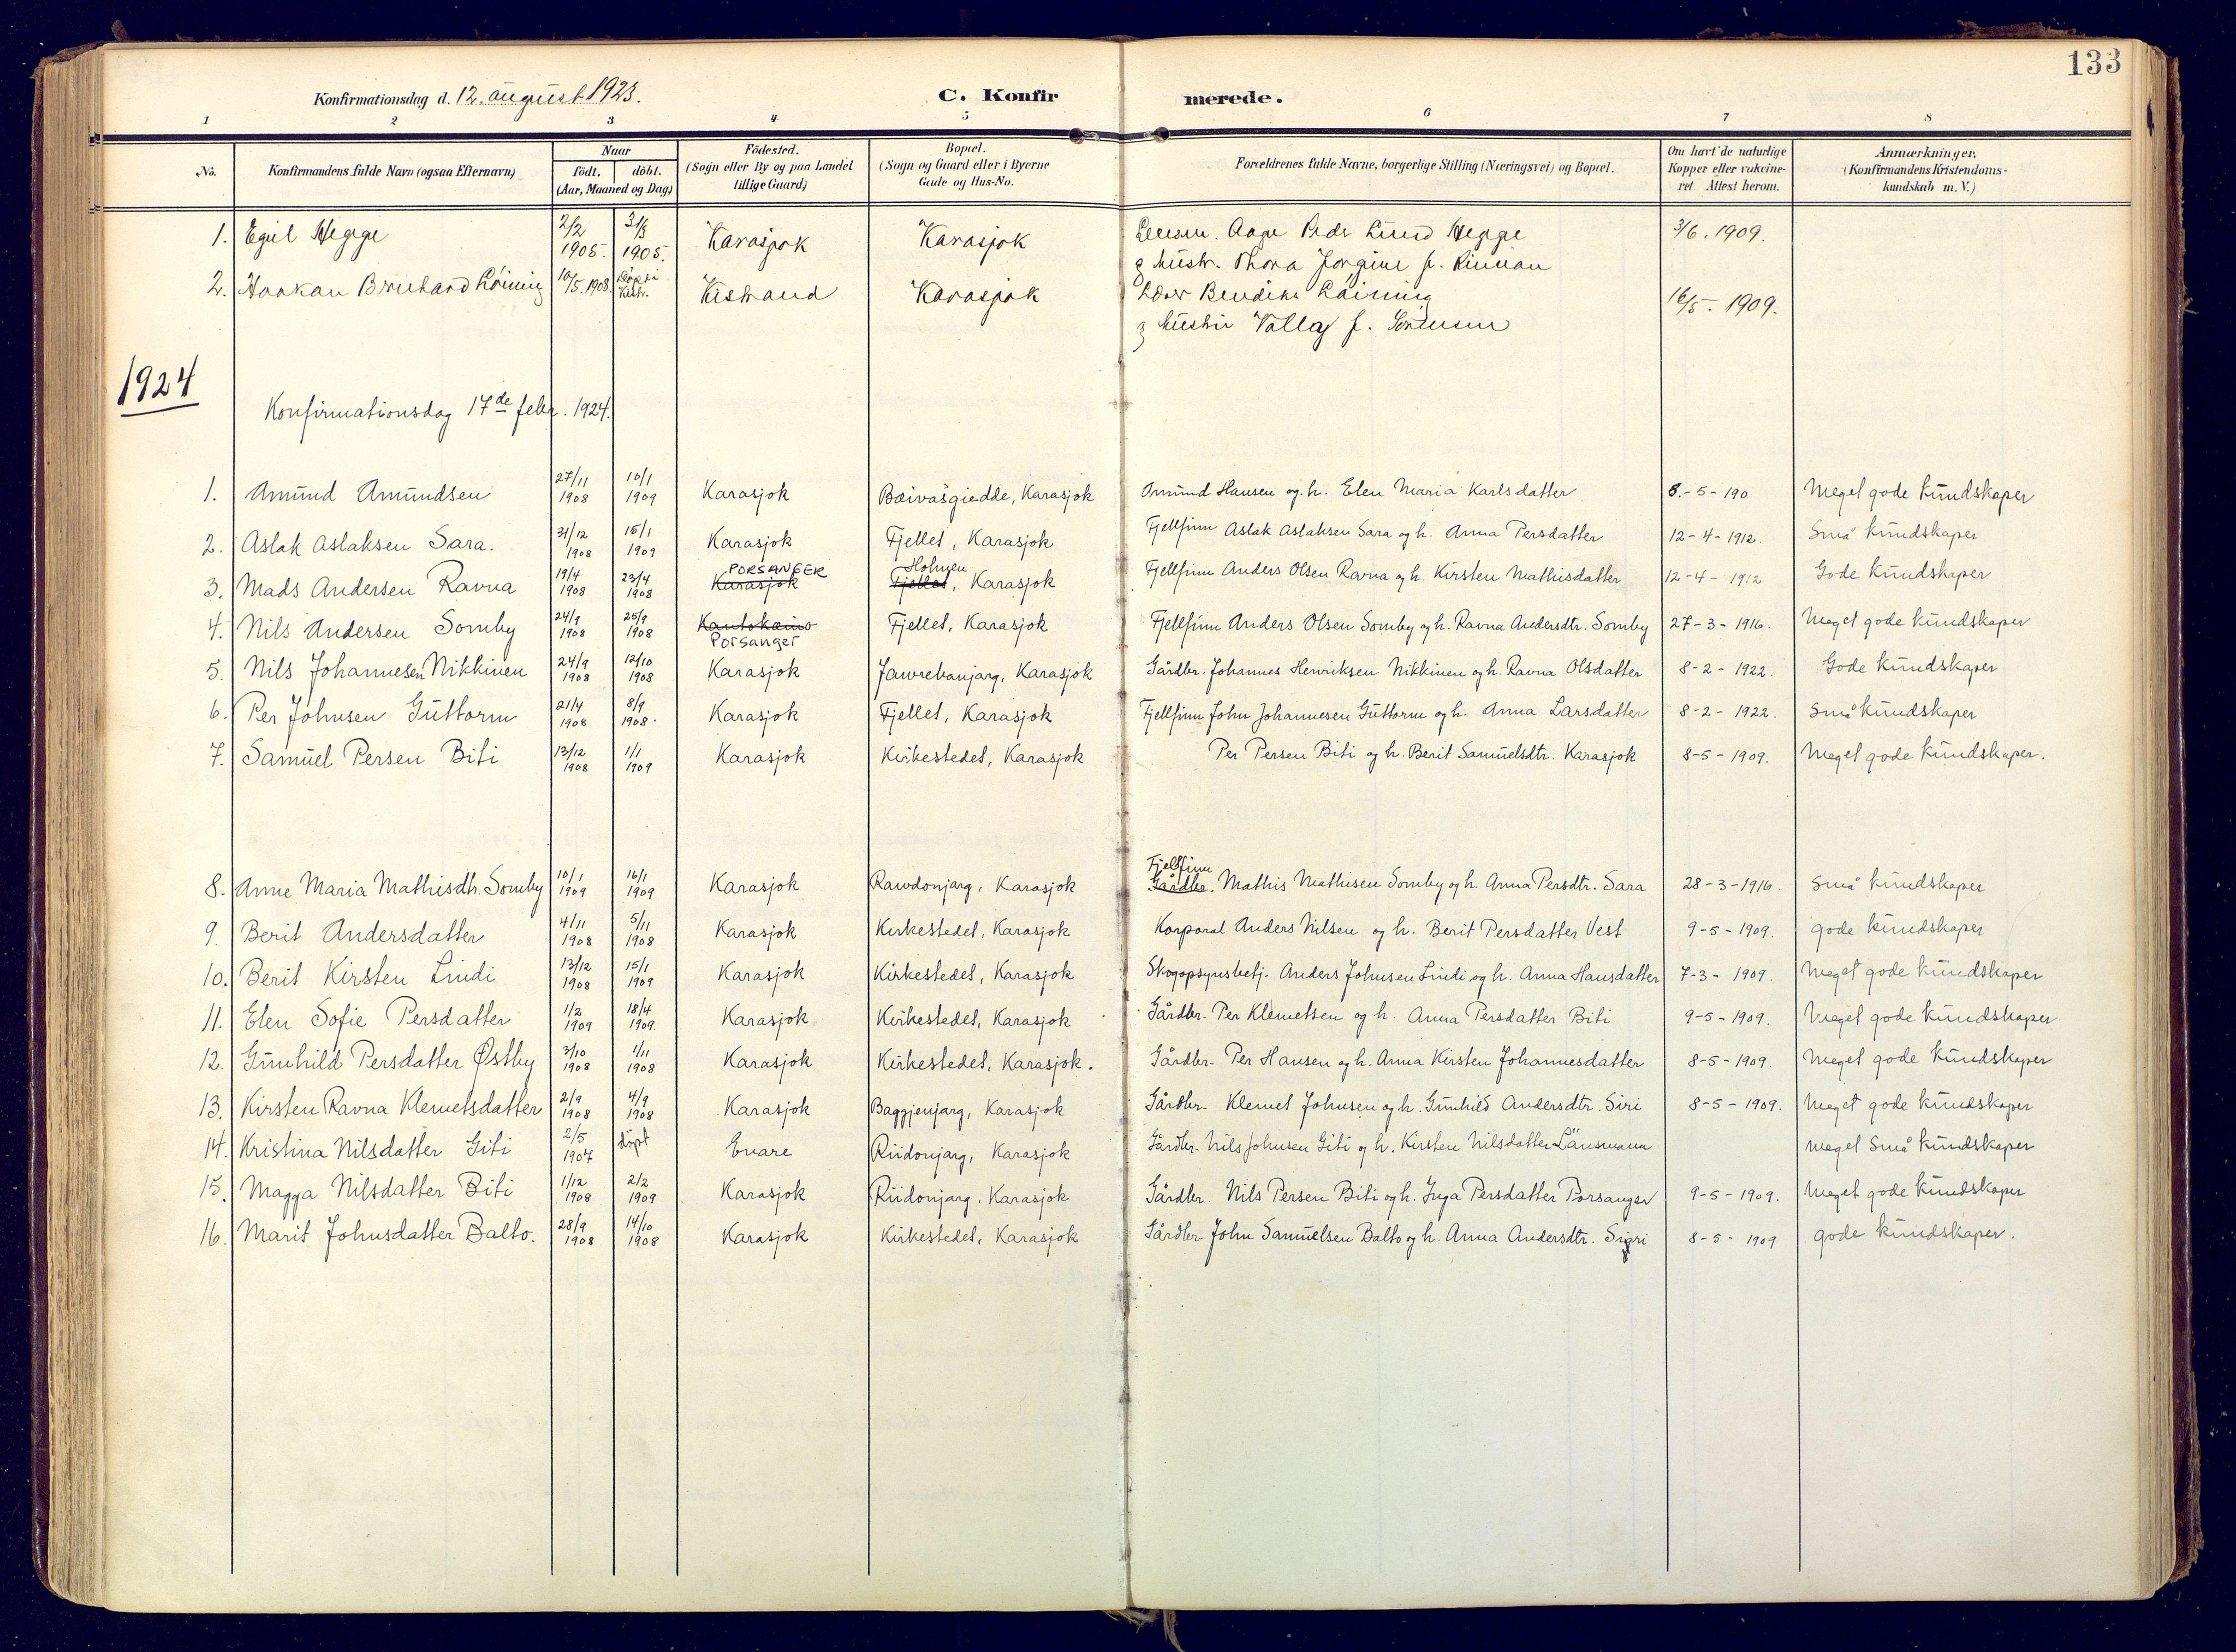 SATØ, Karasjok sokneprestkontor, H/Ha: Ministerialbok nr. 3, 1907-1926, s. 133